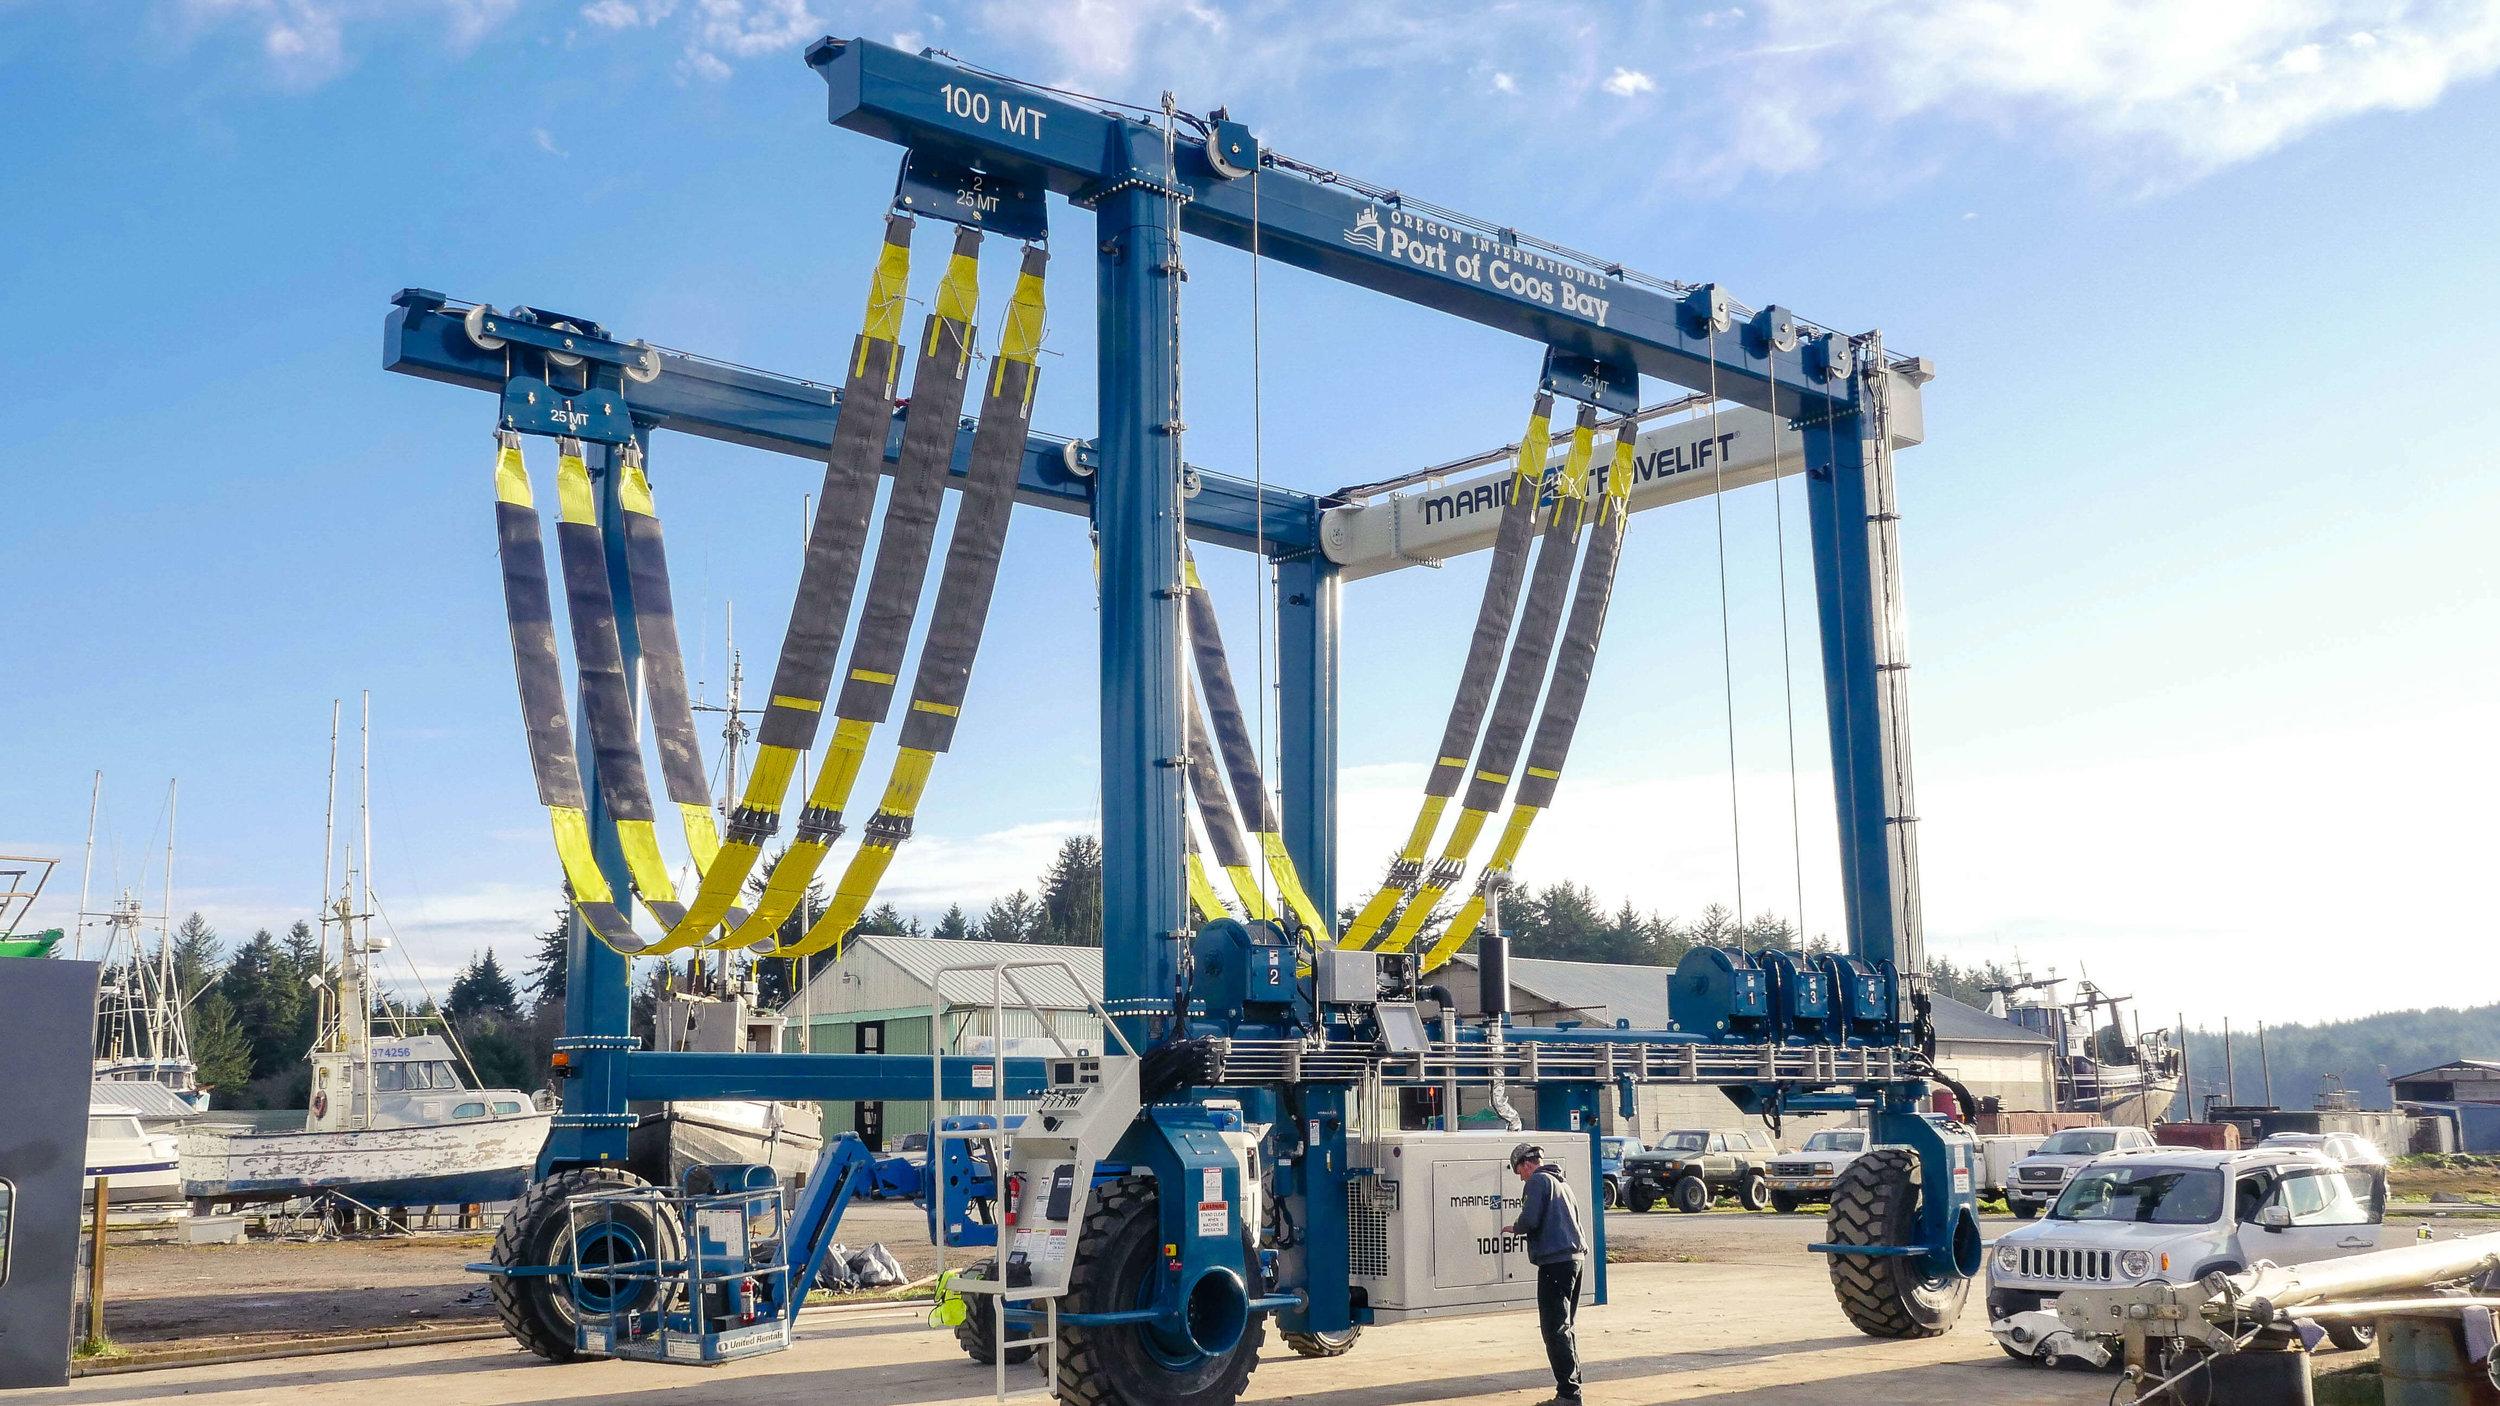 Charleston Shipyard Travel Lift